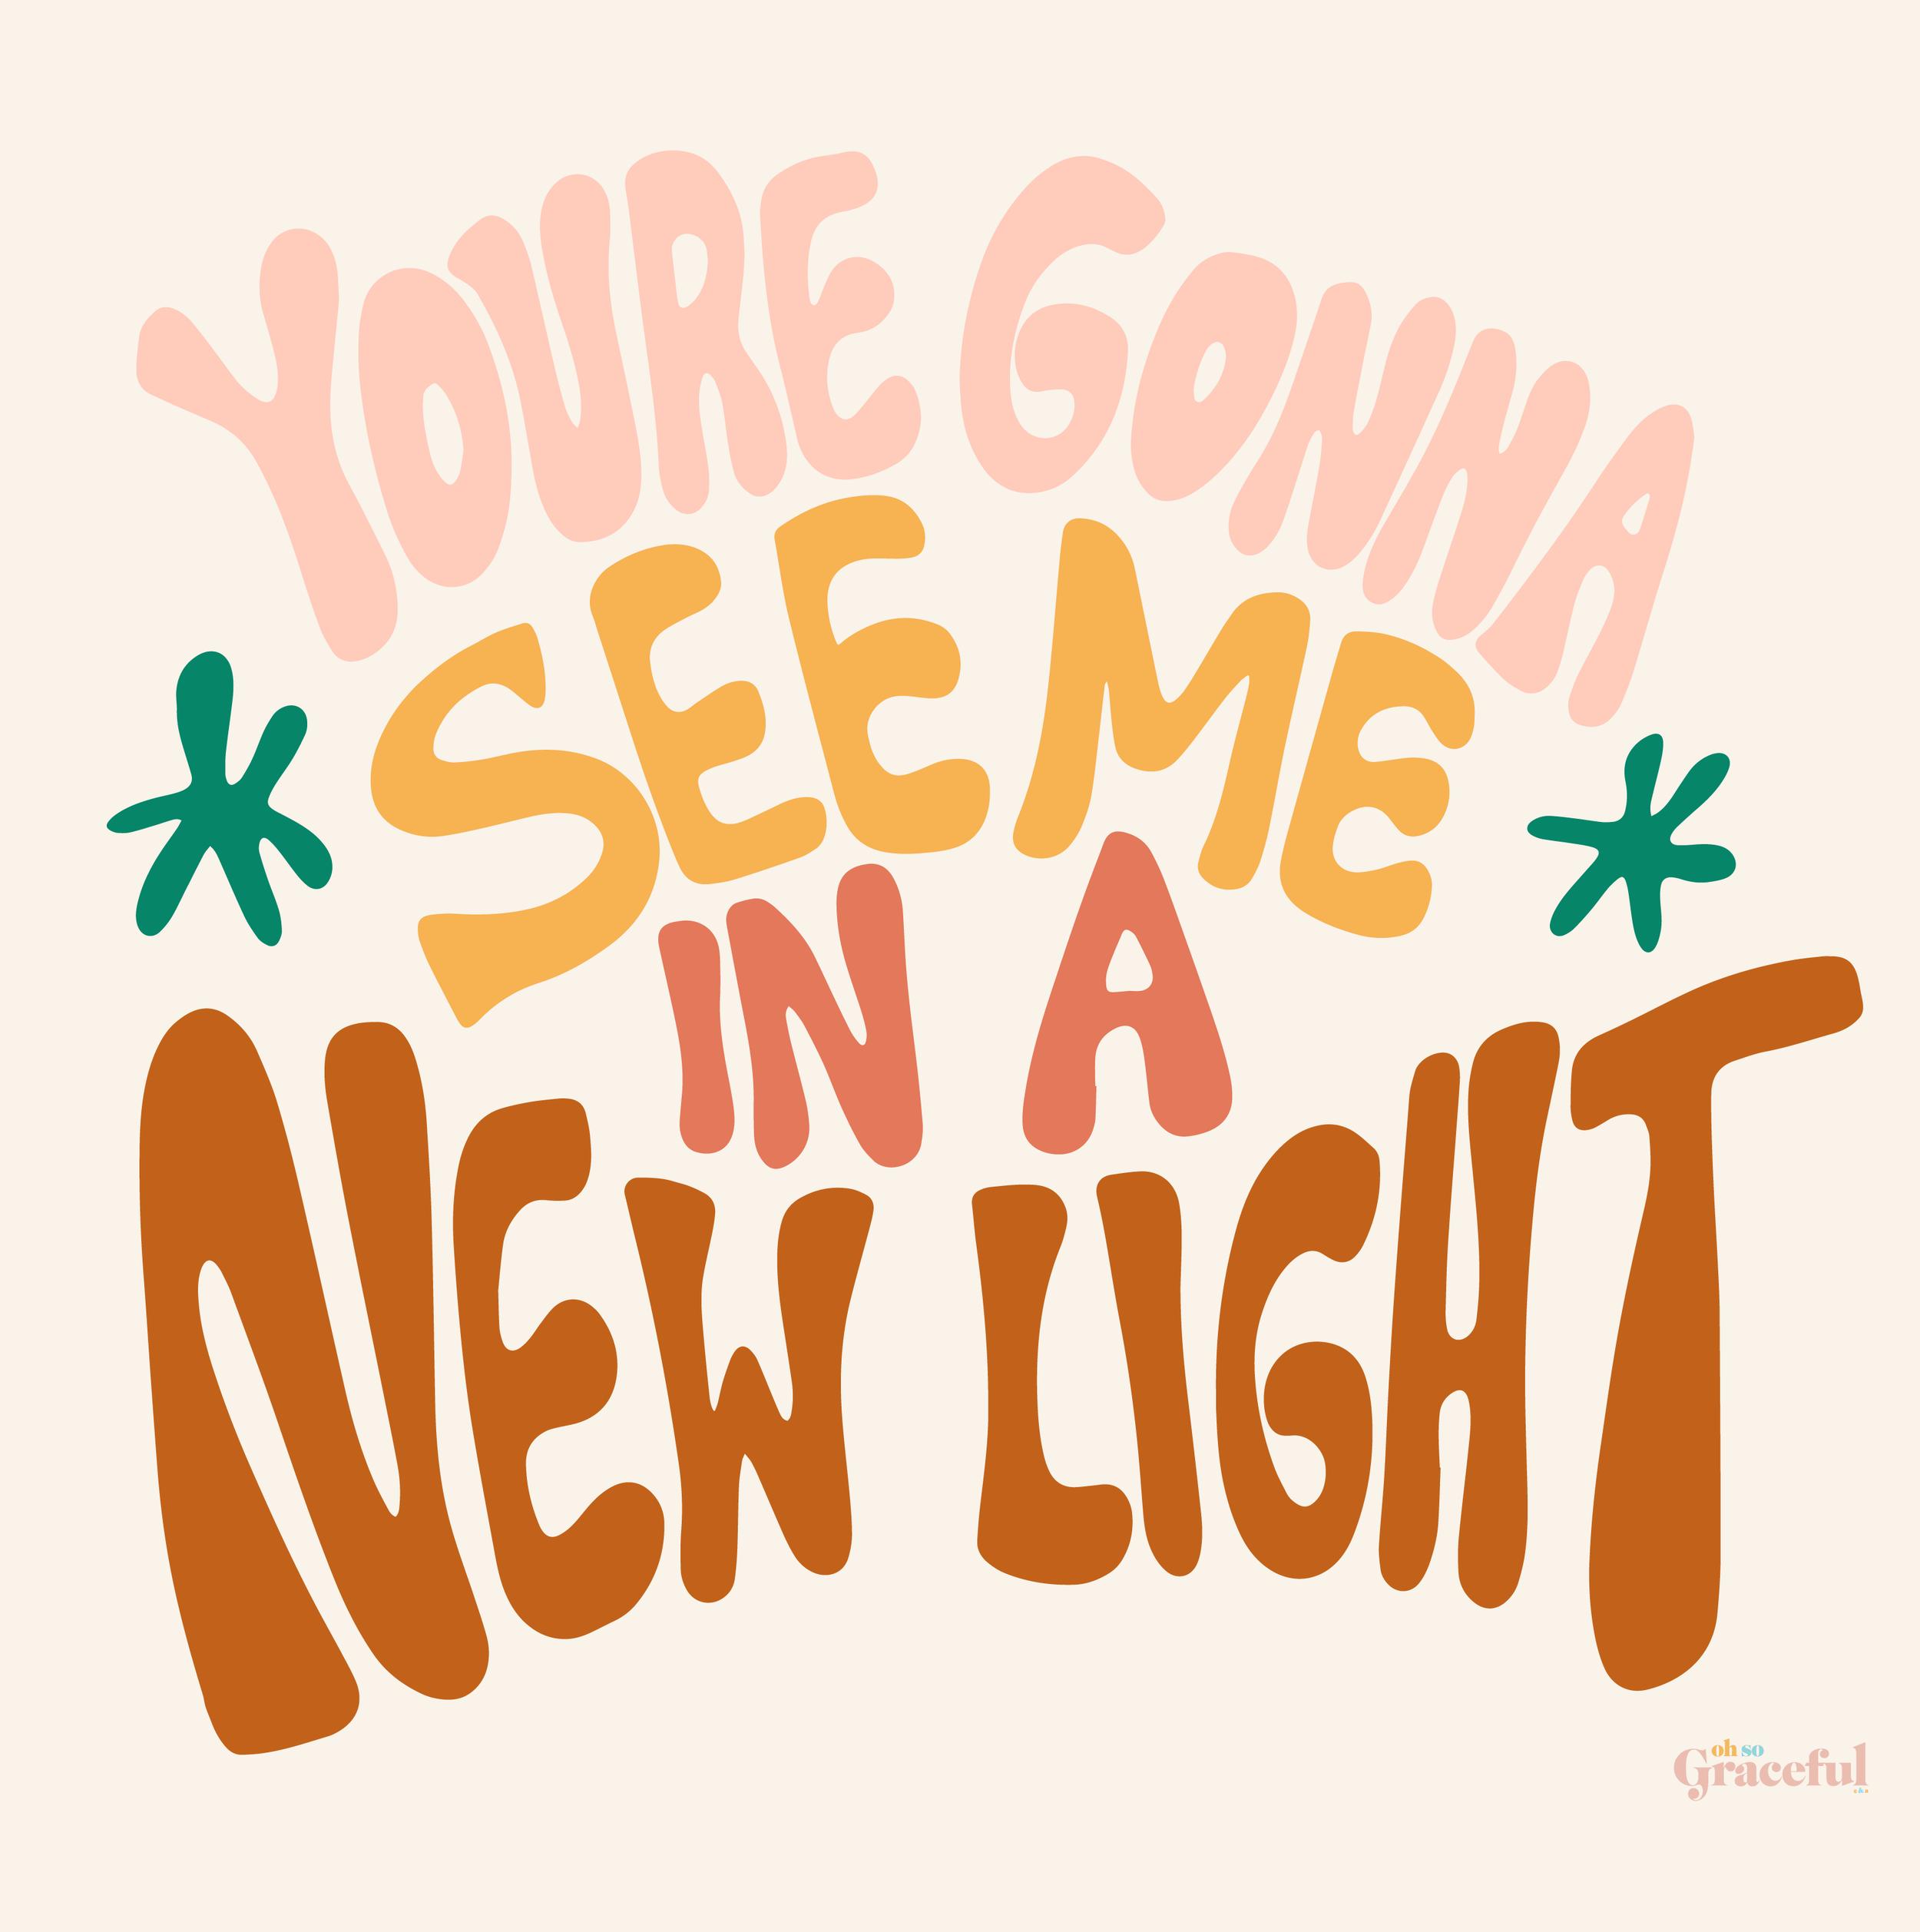 newlight.png